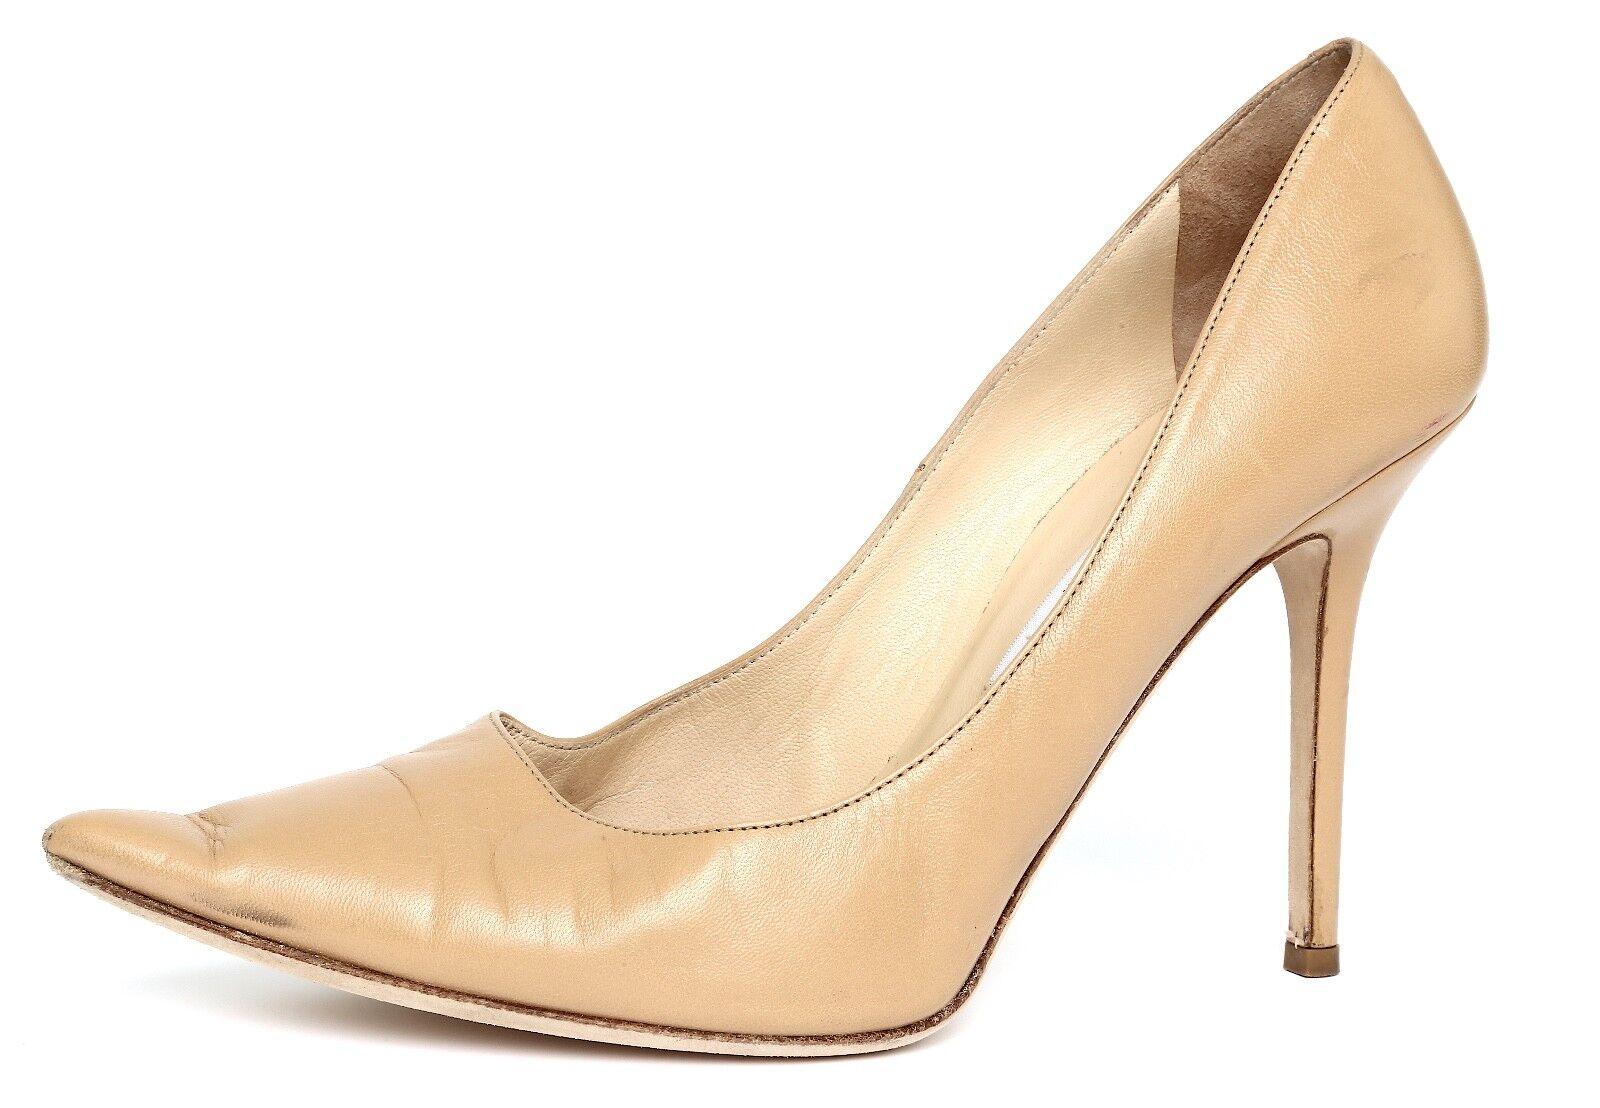 negozio di sconto Jimmy Jimmy Jimmy Choo Donna  Beige Pointed Toe Leather Pumps Sz 39.5 EUR 7441  negozio online